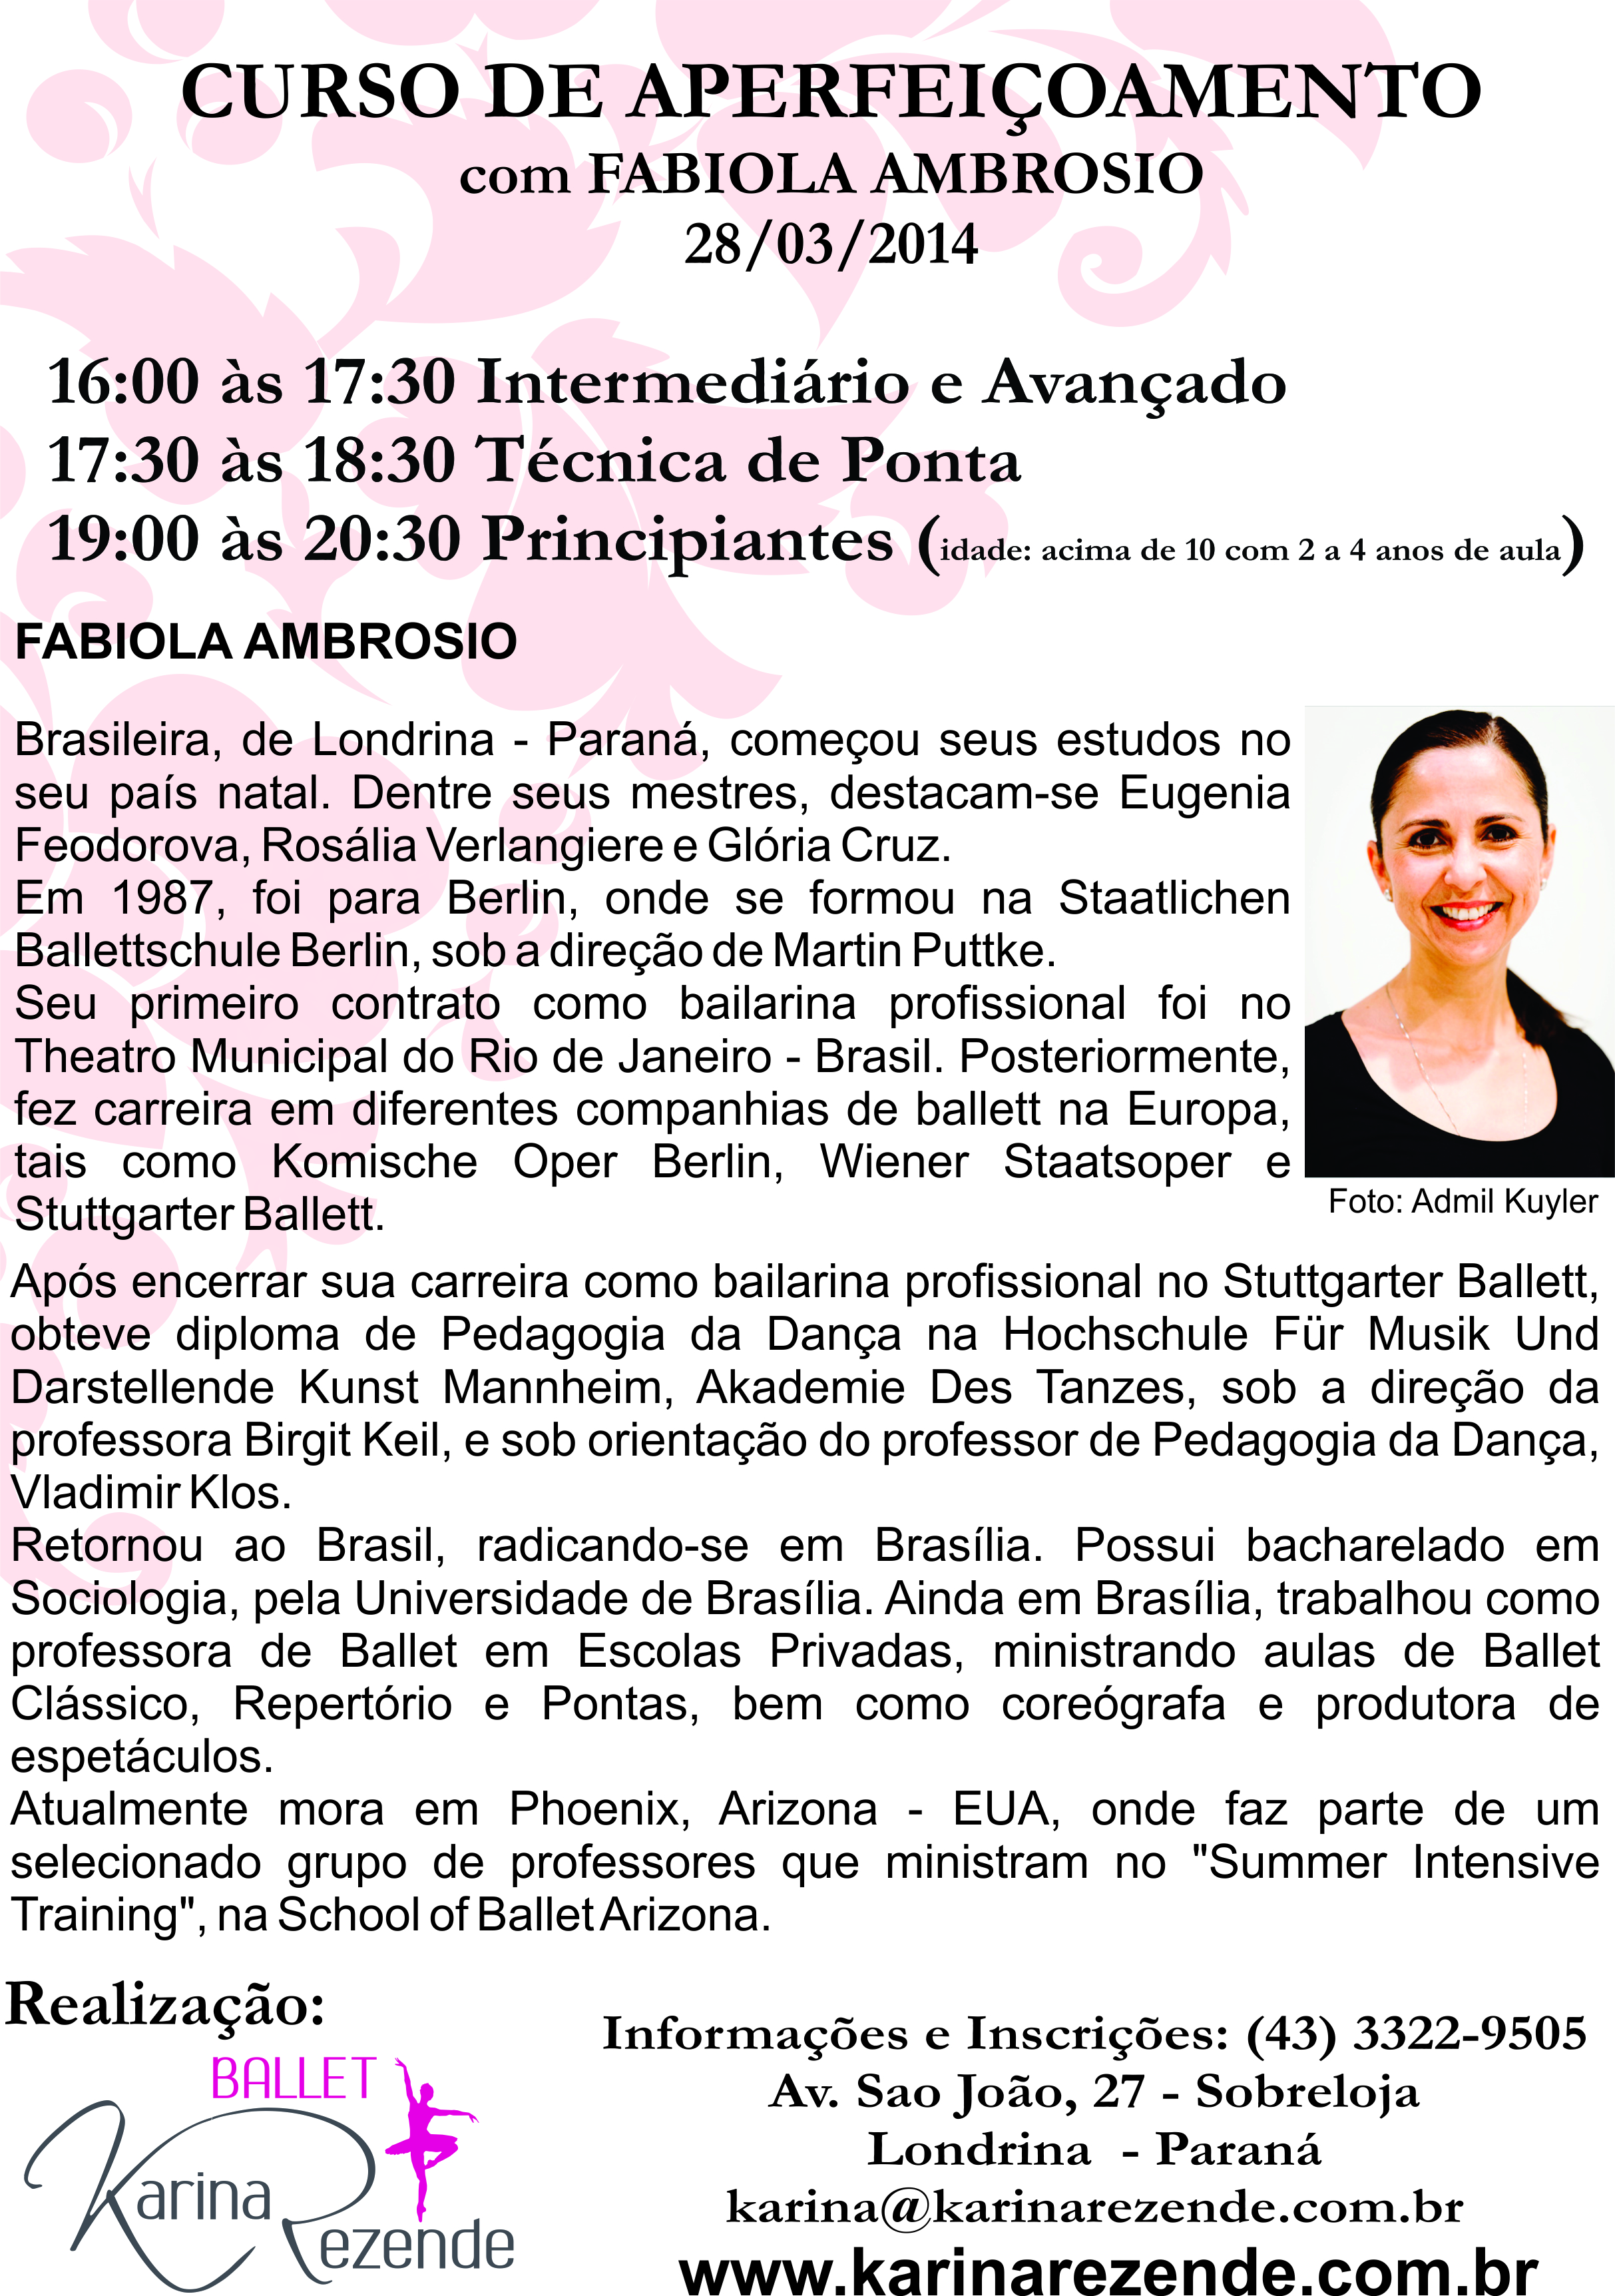 fabiola 2014 revisada (2).jpg